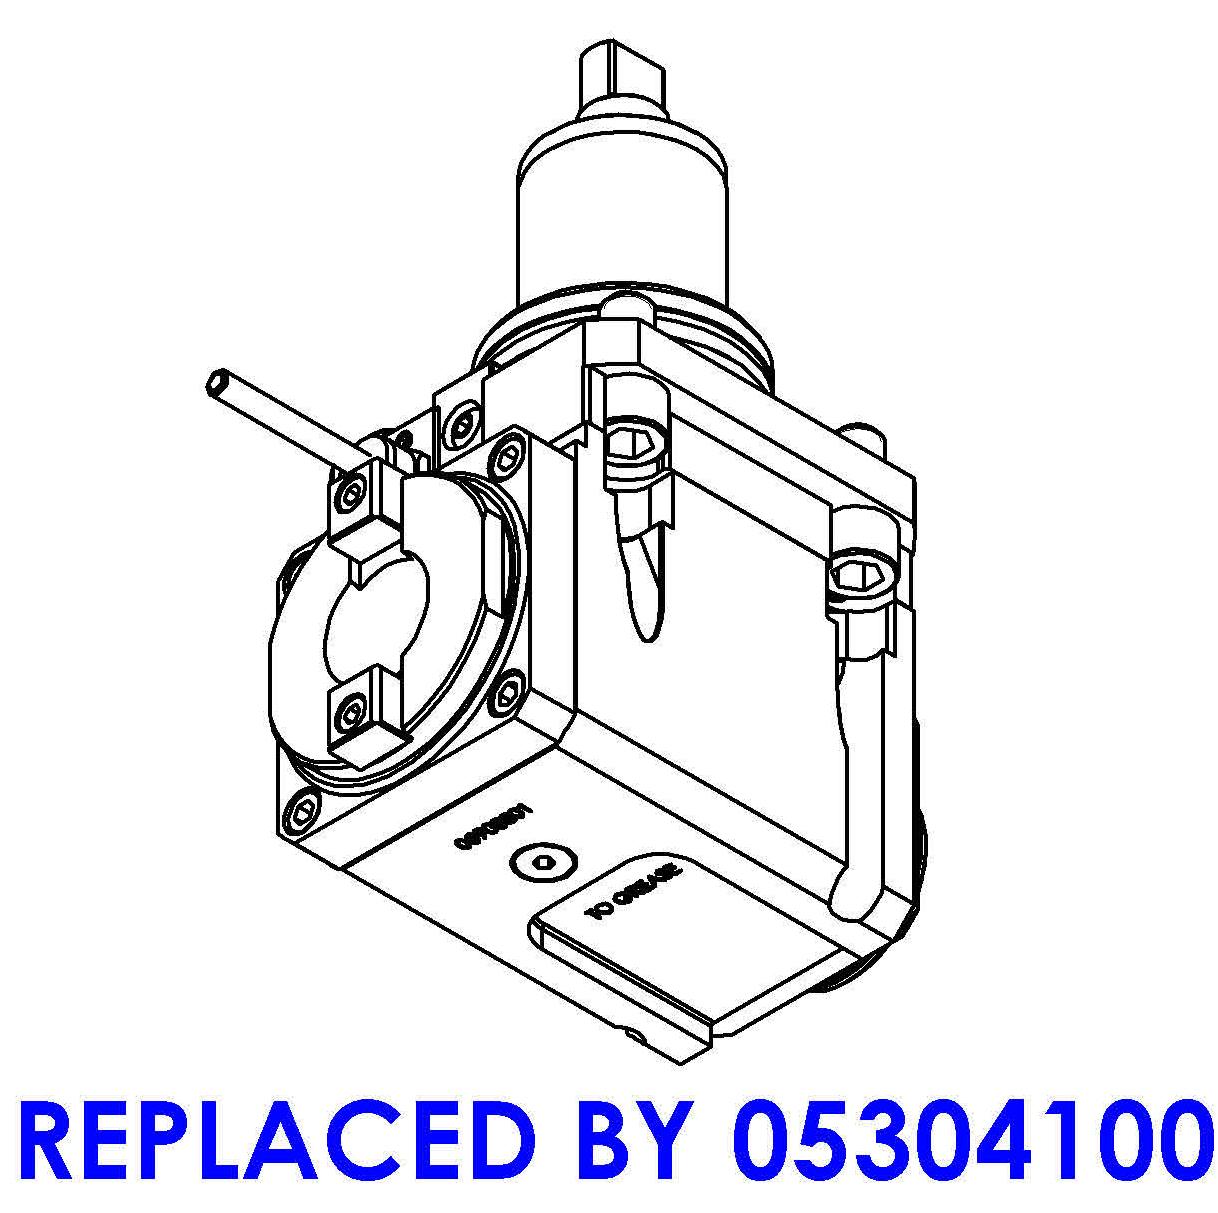 LT-A BMT65 ISO-BT30 L-R H72.